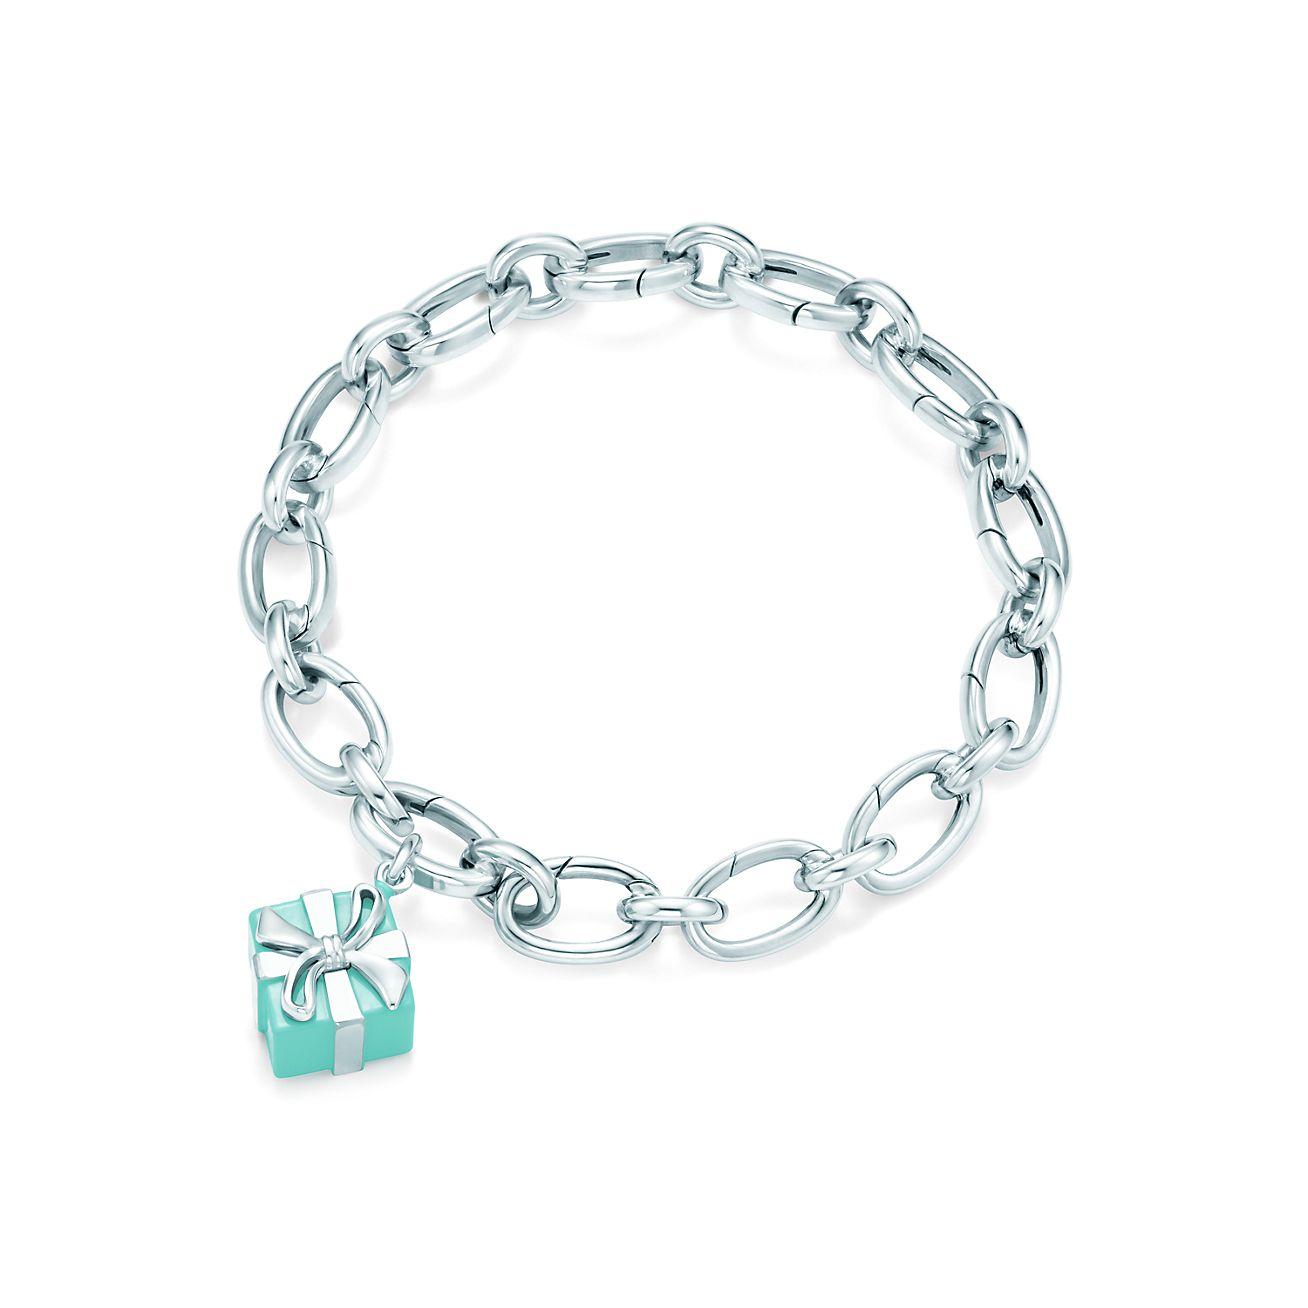 Tiffany Box charm in sterling silver Tiffany & Co. 8HheU